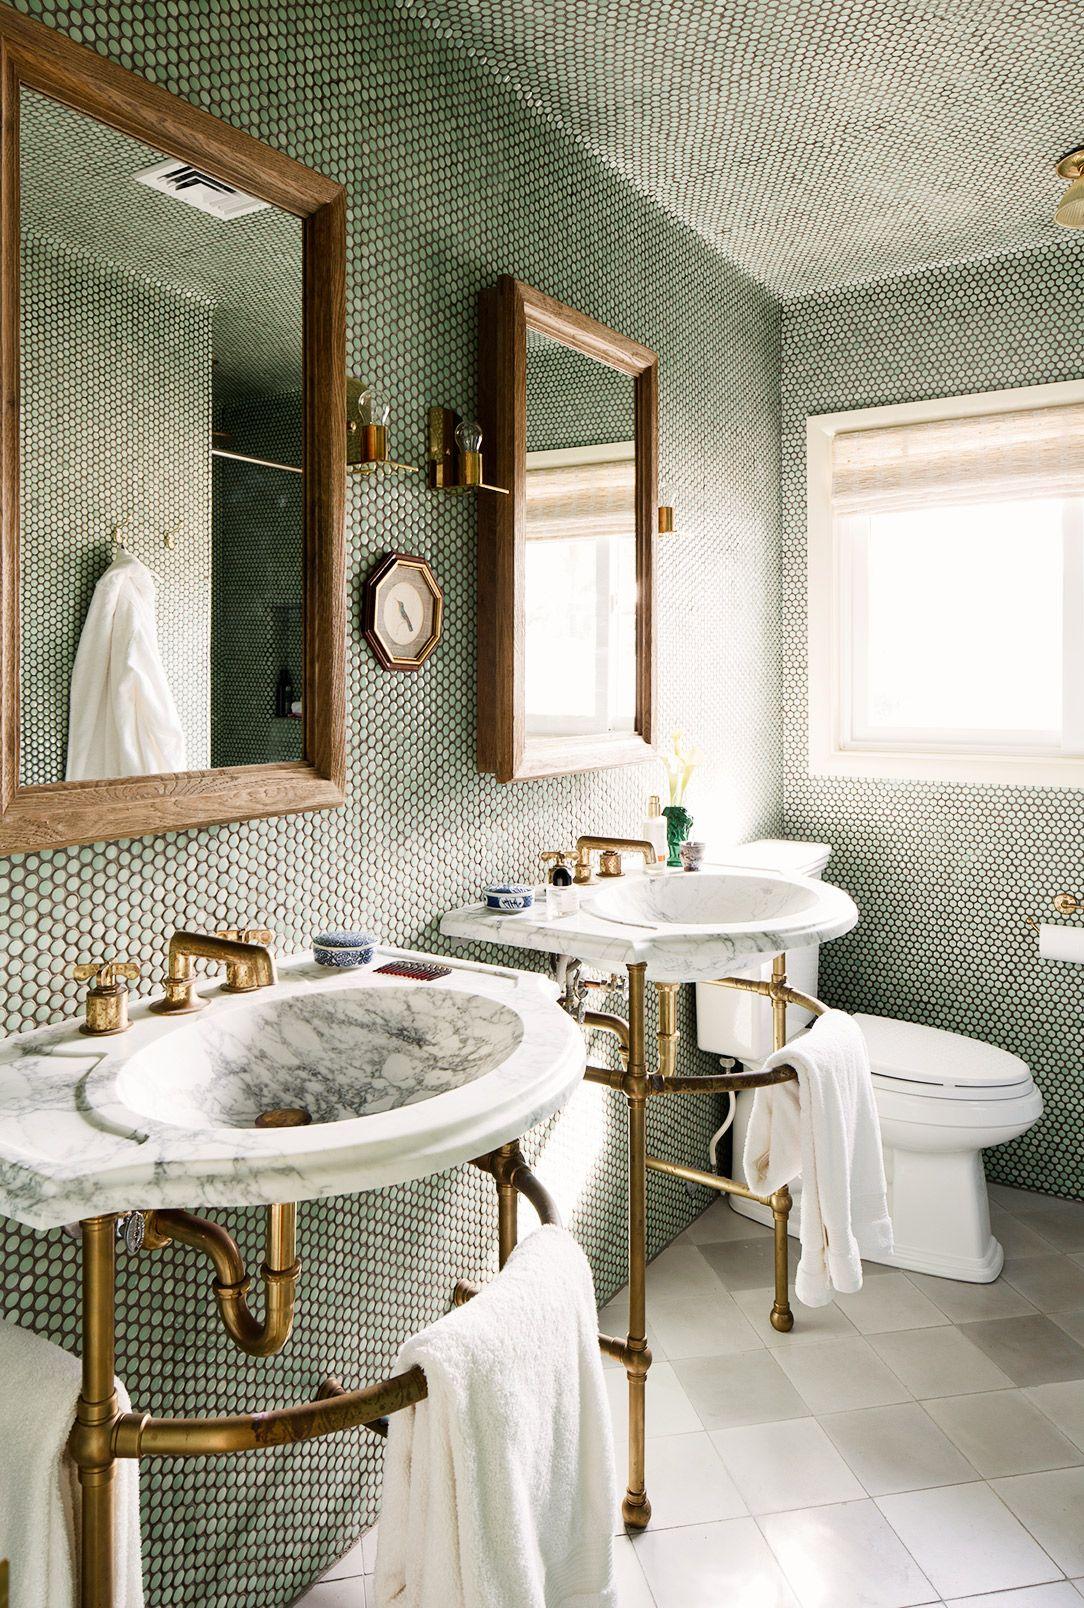 Home Bathrooms Bathroom Penny Round Tiles Bathroom Inspiration